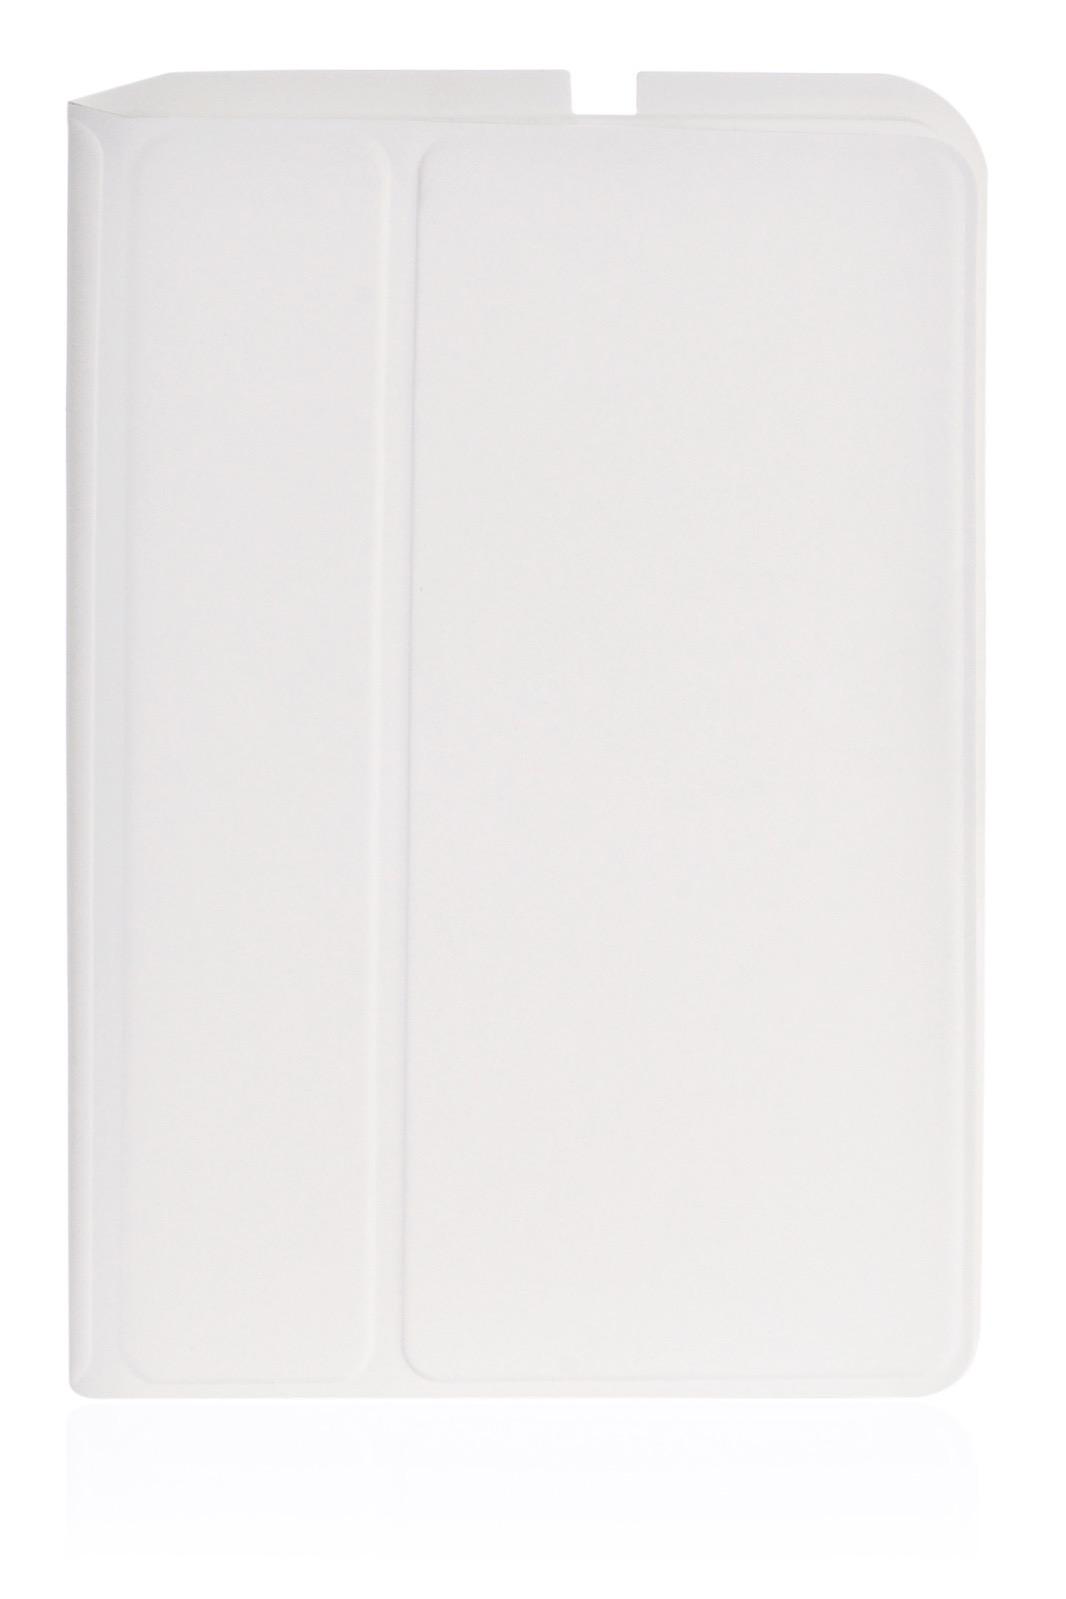 "Чехол для планшета iNeez книжка полиуретан cover 340050 для Samsung Tab 7.7"", белый"